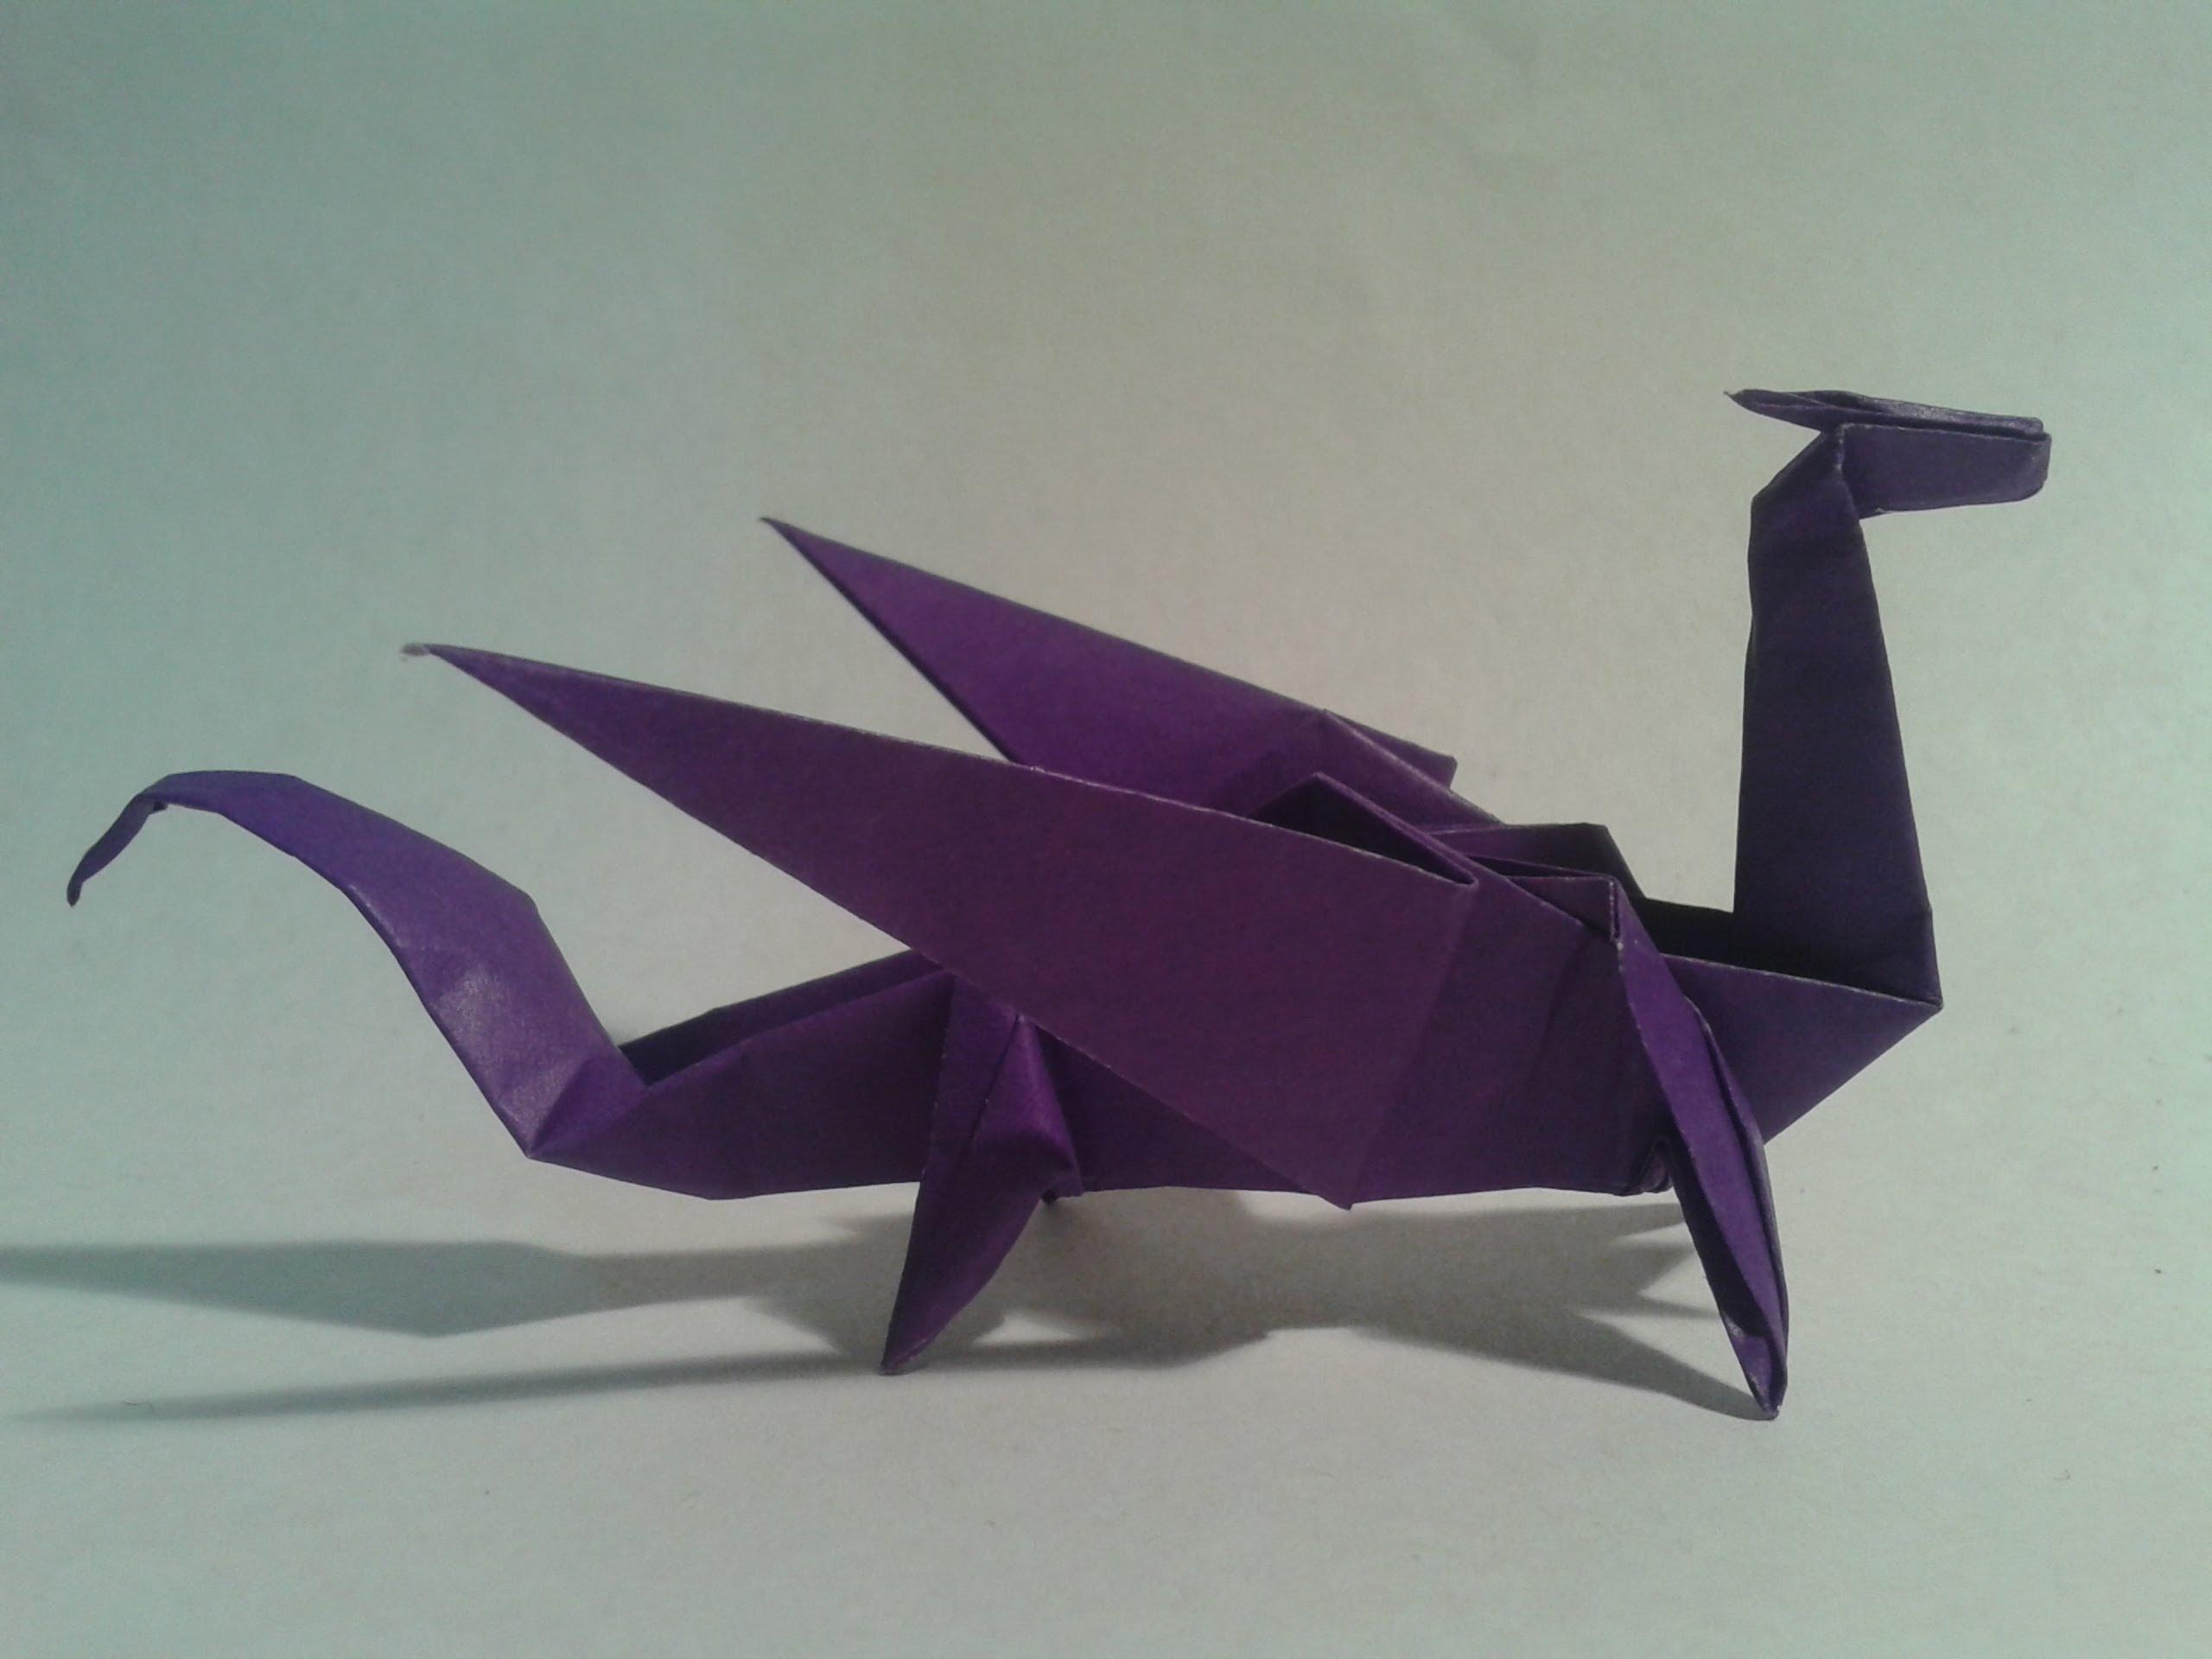 Kade Chan Origami Blog 香港摺紙工作室 (博客): Fiery Dragon ... | 1920x2560